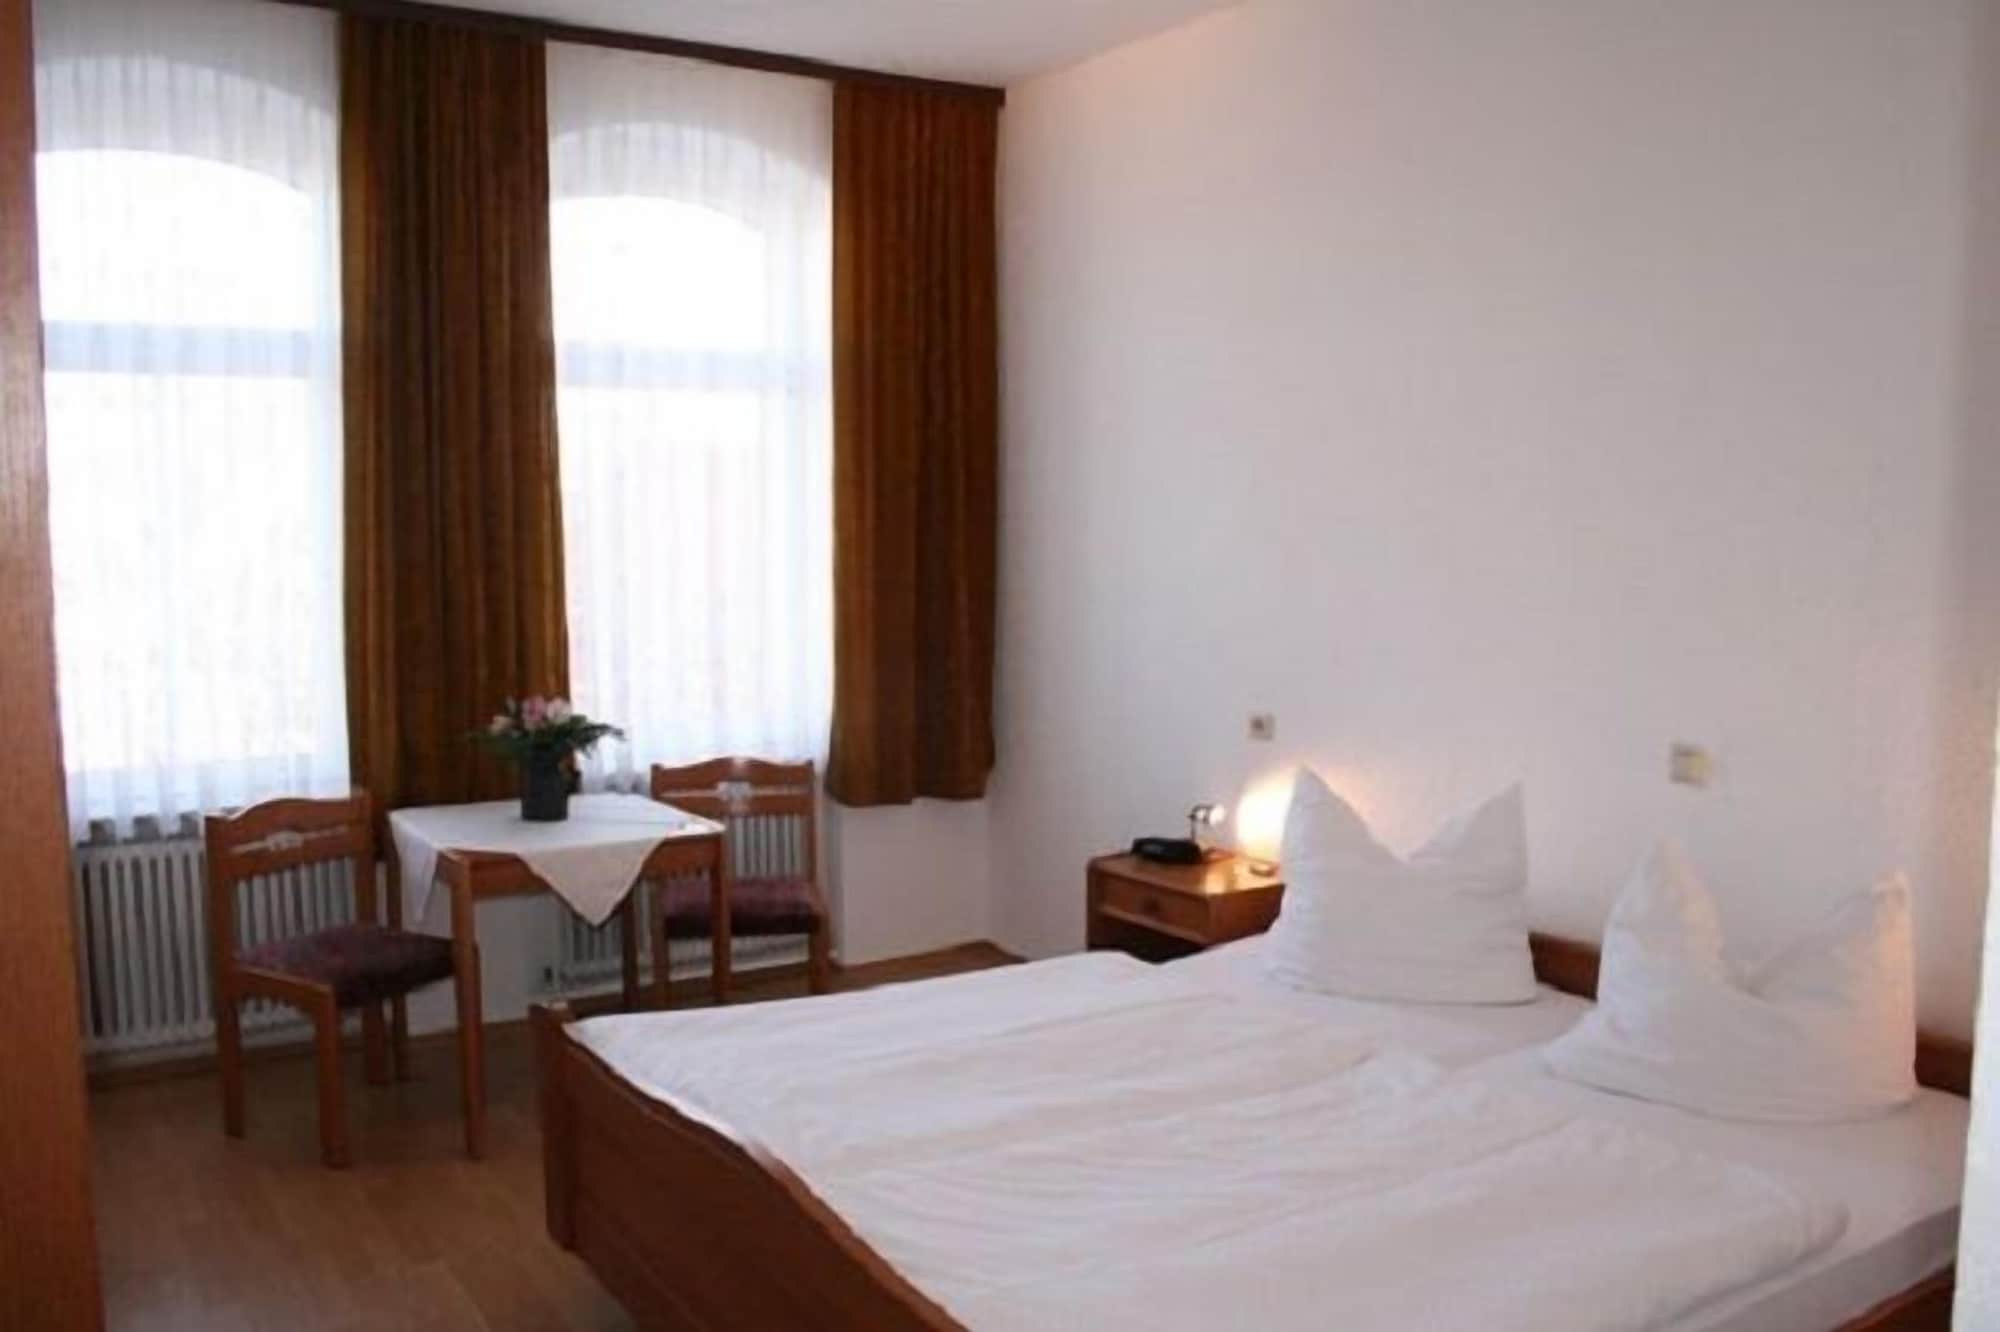 Hotel Garni am Domplatz, Erfurt